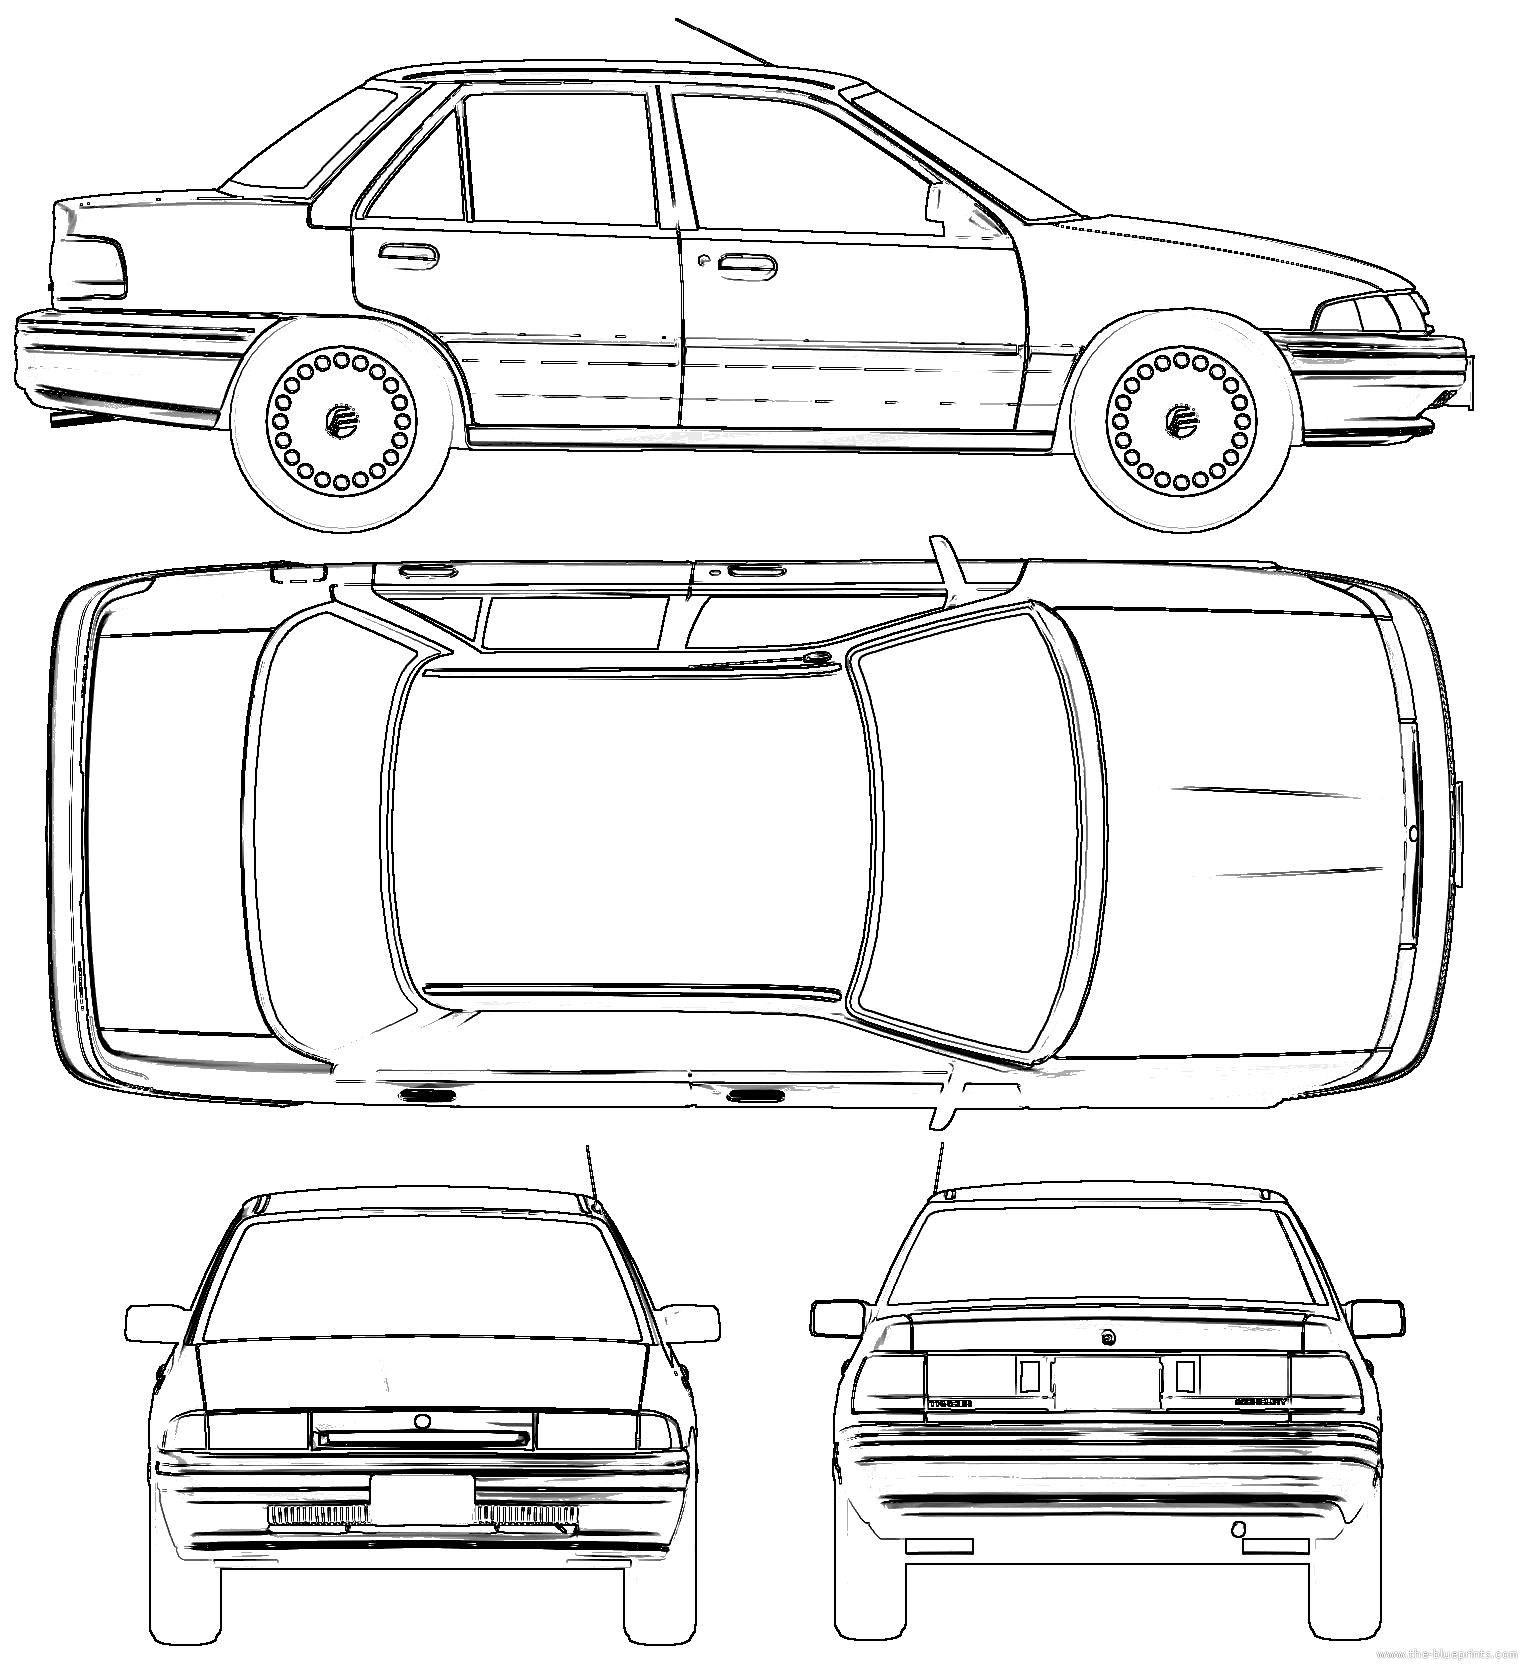 1994 Mercury Tracer Camshaft: Blueprints > Cars > Mercury > Mercury